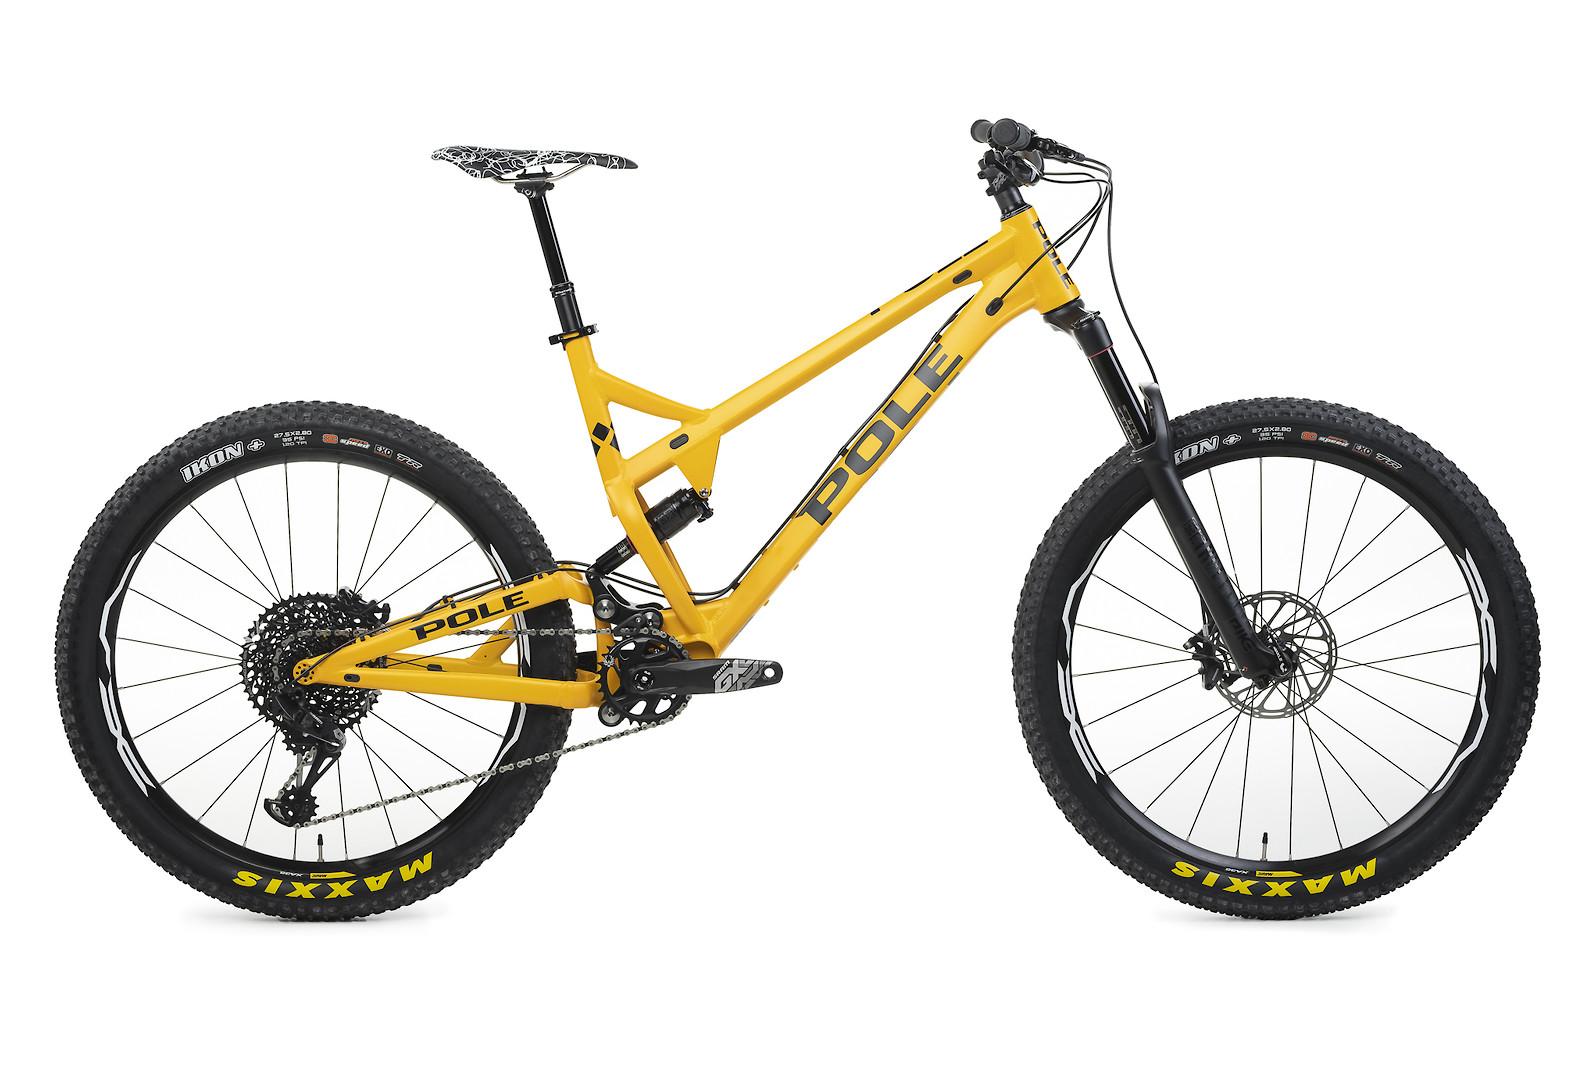 2020 Pole Evolink 131 TR  Taiga Yellow